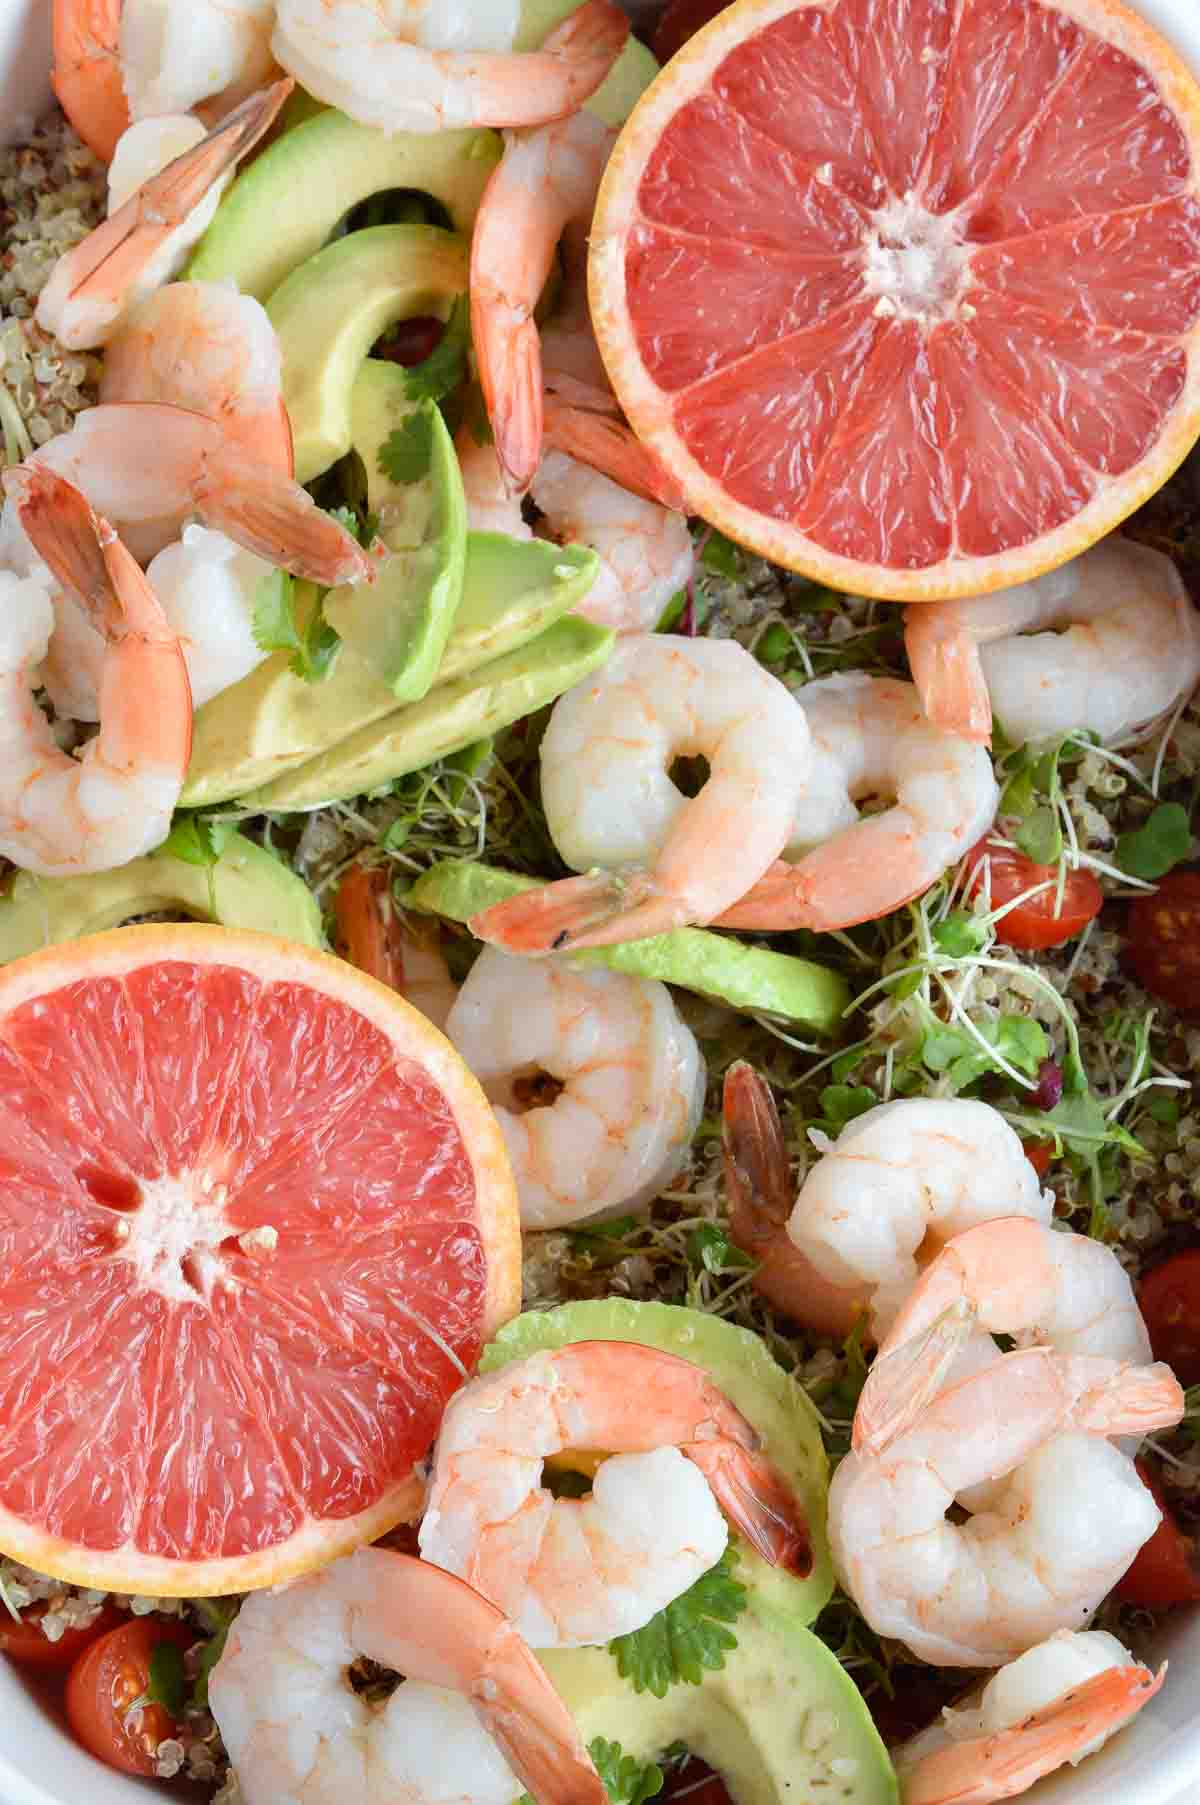 Shrimp Avocado Salad with Quinoa and Grapefruit Dressing is a bright, flavorful and healthy recipe! A simple salad made with boiled shrimp, avocados, tomatoes, quinoa, micro greens and homemade grapefruit vinaigrette.